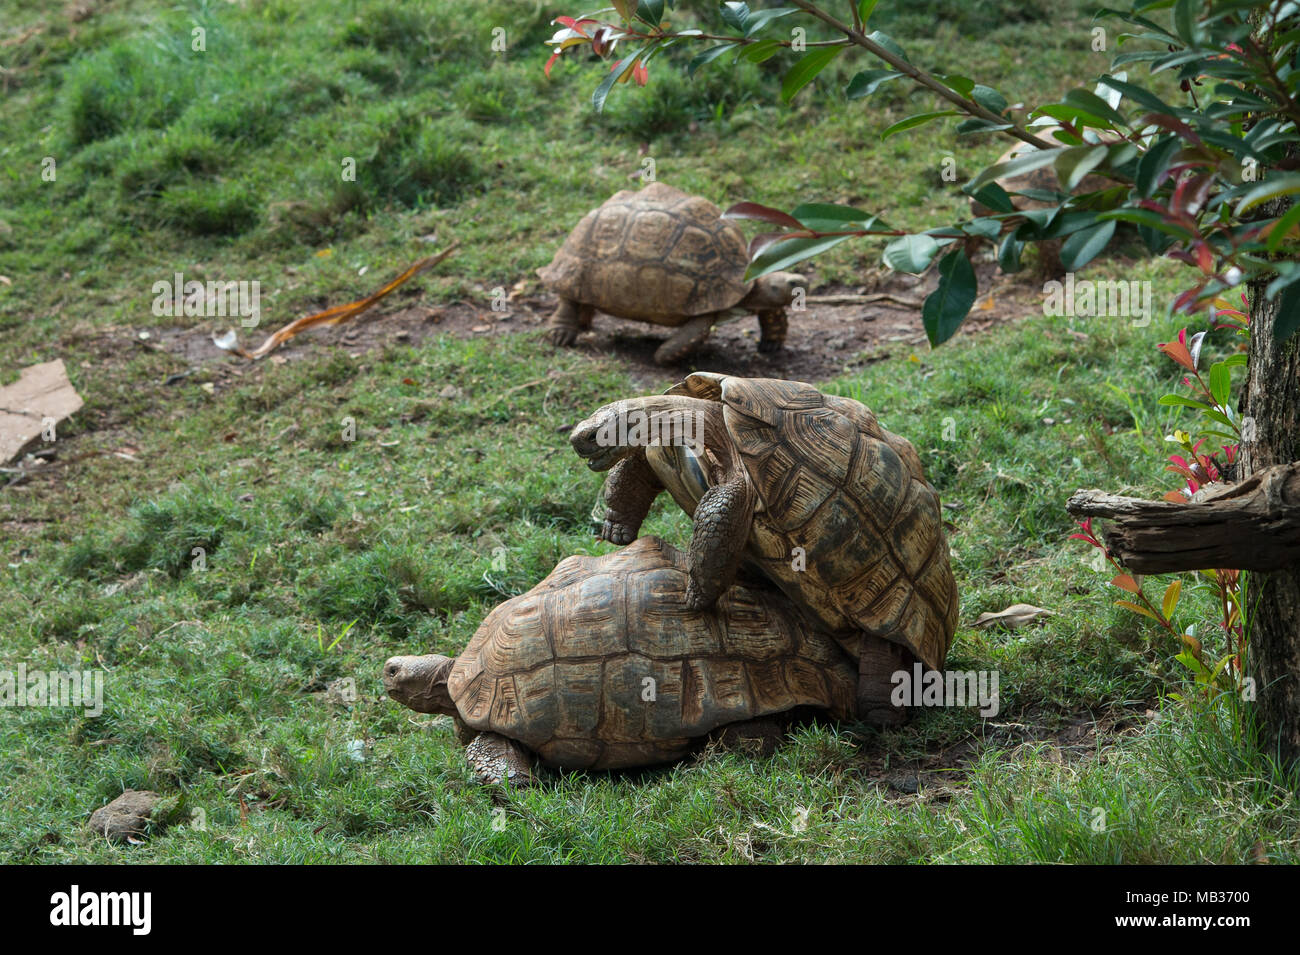 Leopard tortoise, Stigmochelys pardalis, Testudinidae, Kenya, Africa - Stock Image